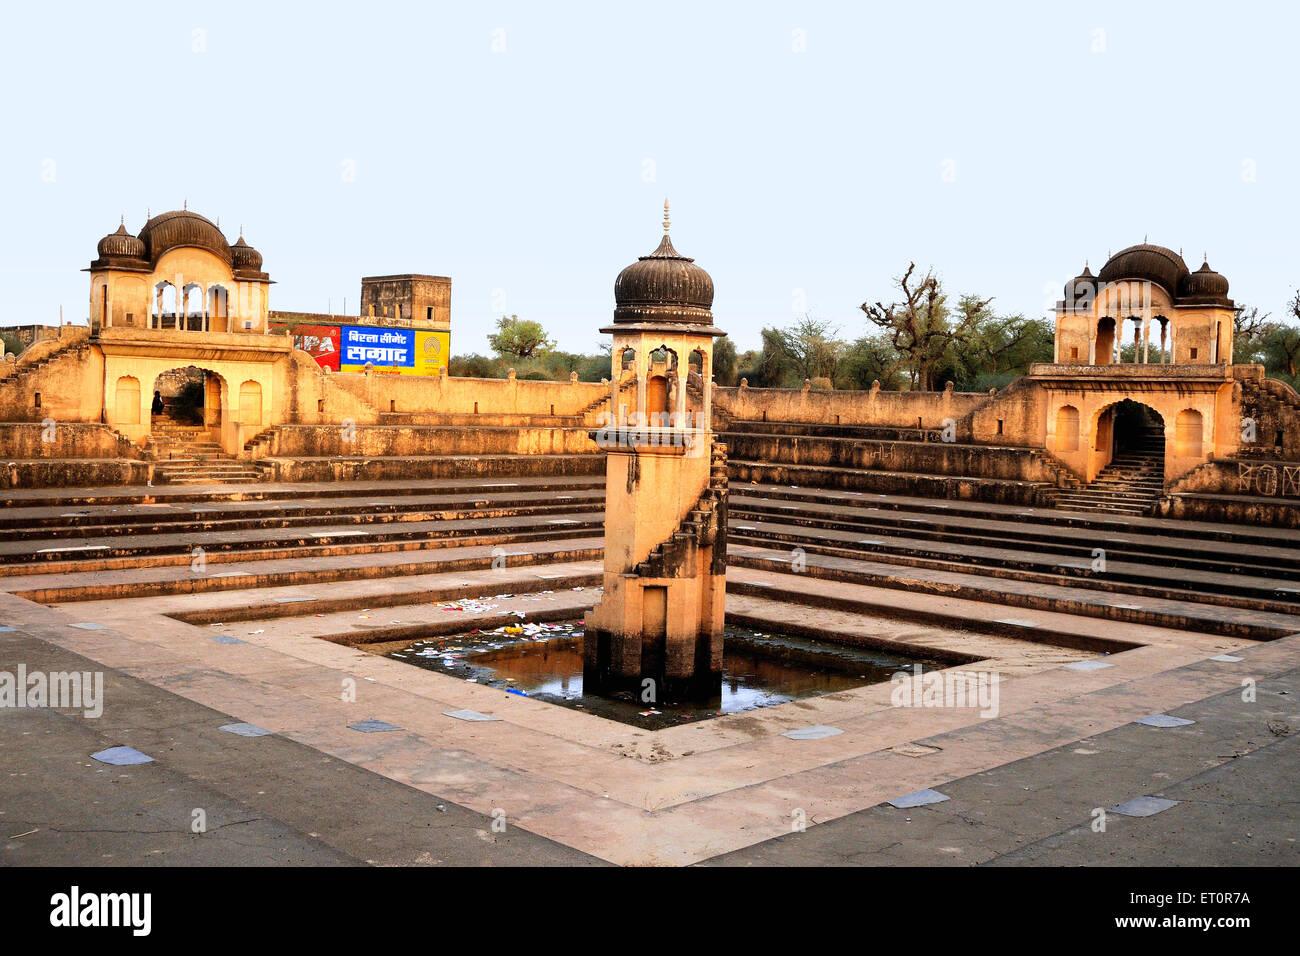 View of vacant pond ; Fatehpur Shekhavati ; Rajasthan ; India - Stock Image